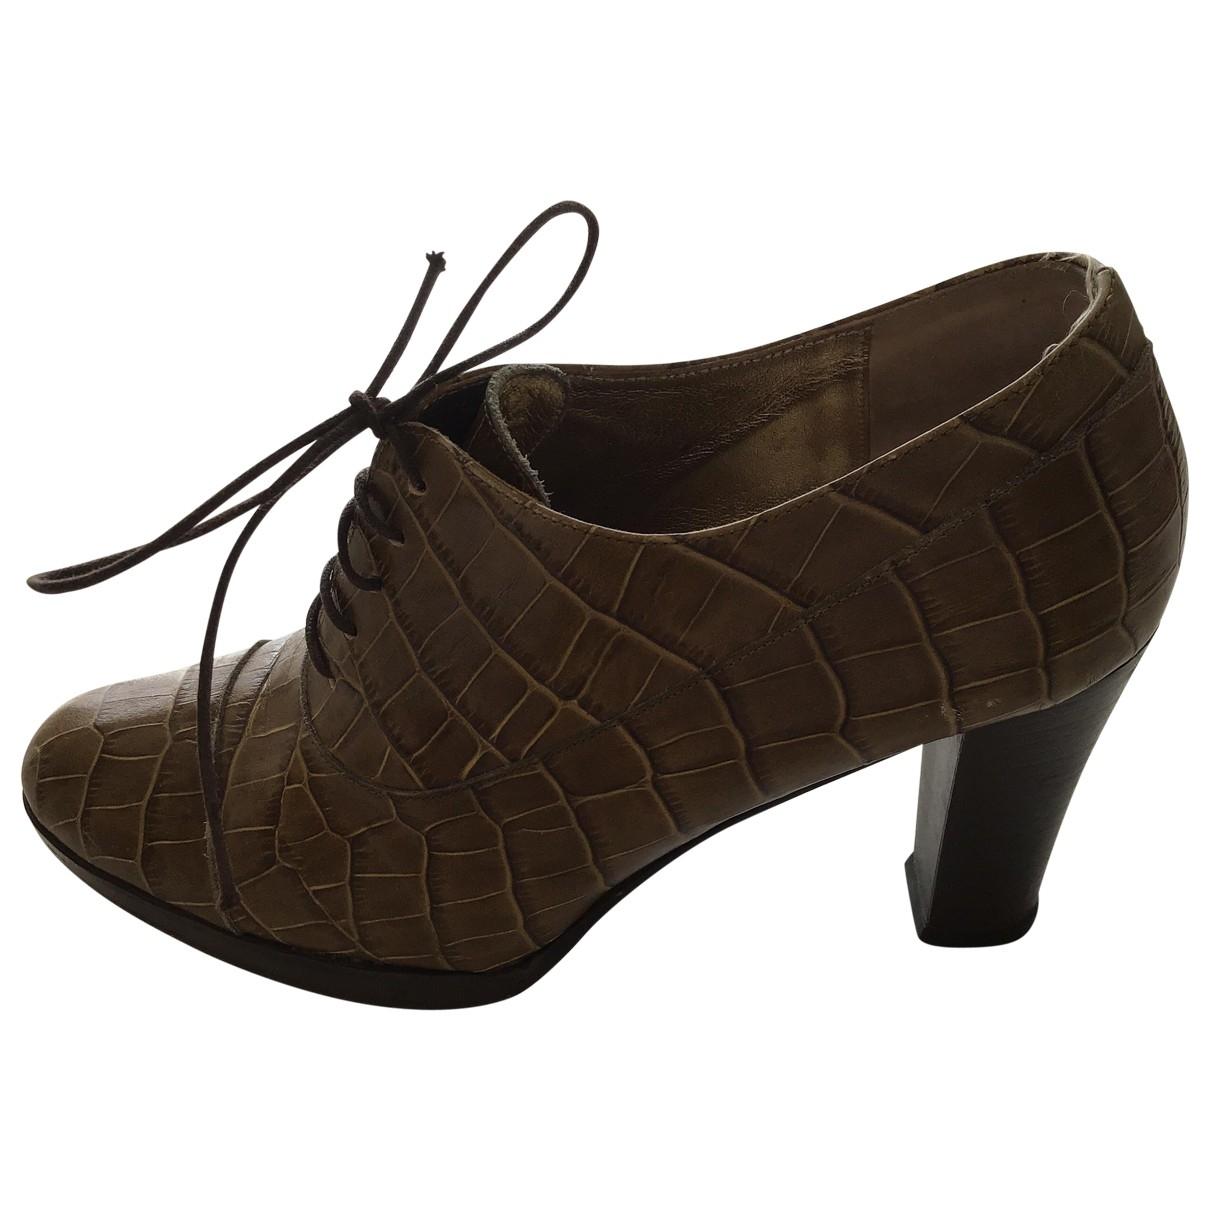 Elegance Paris \N Khaki Leather Lace ups for Women 37 EU